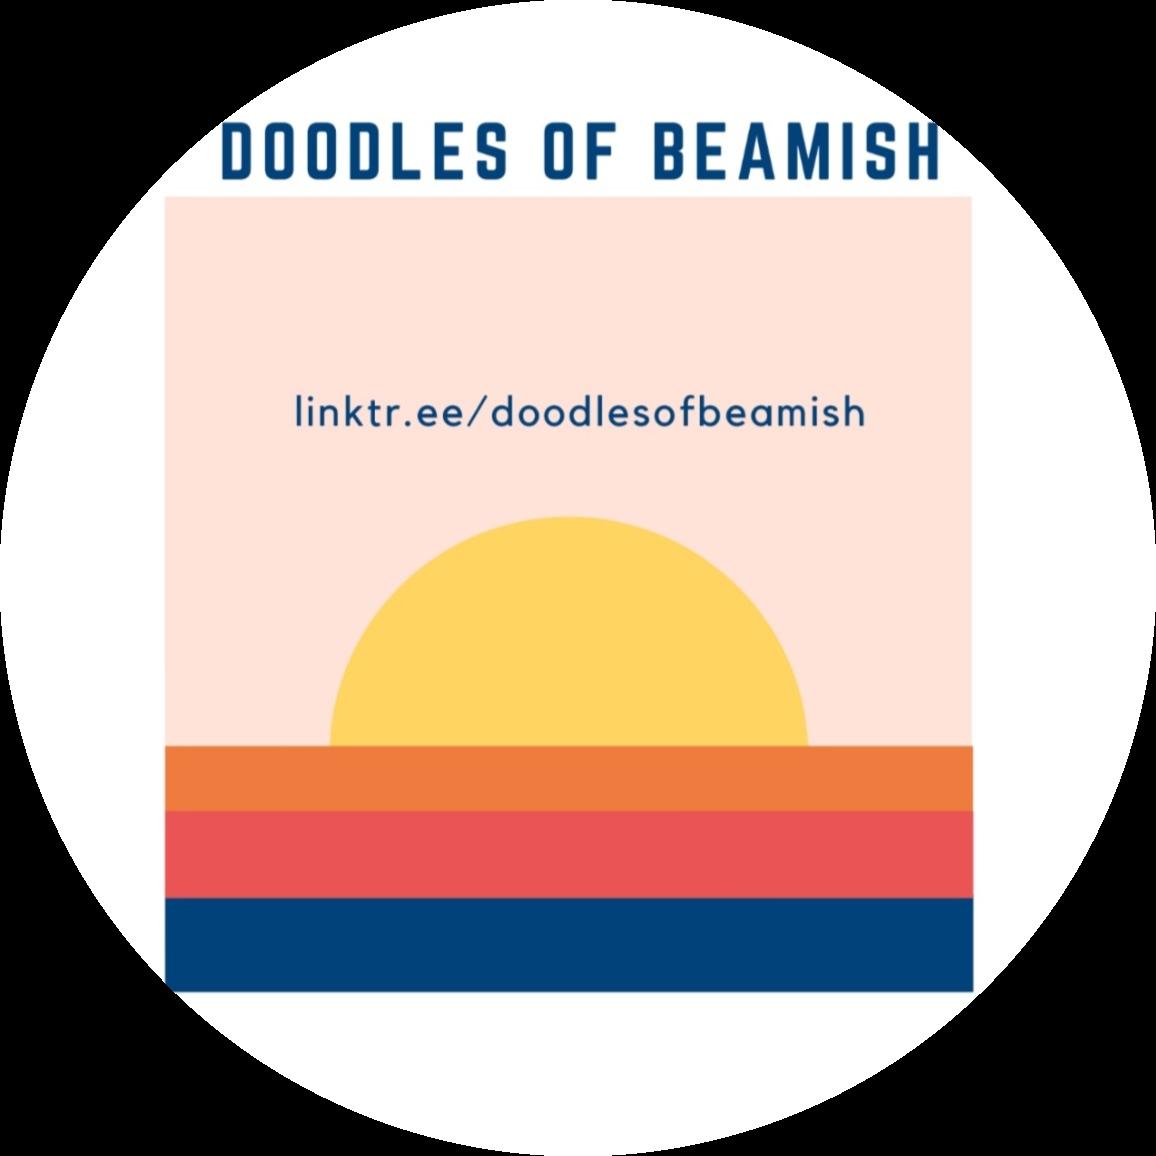 @Doodlesofbeamish Profile Image | Linktree